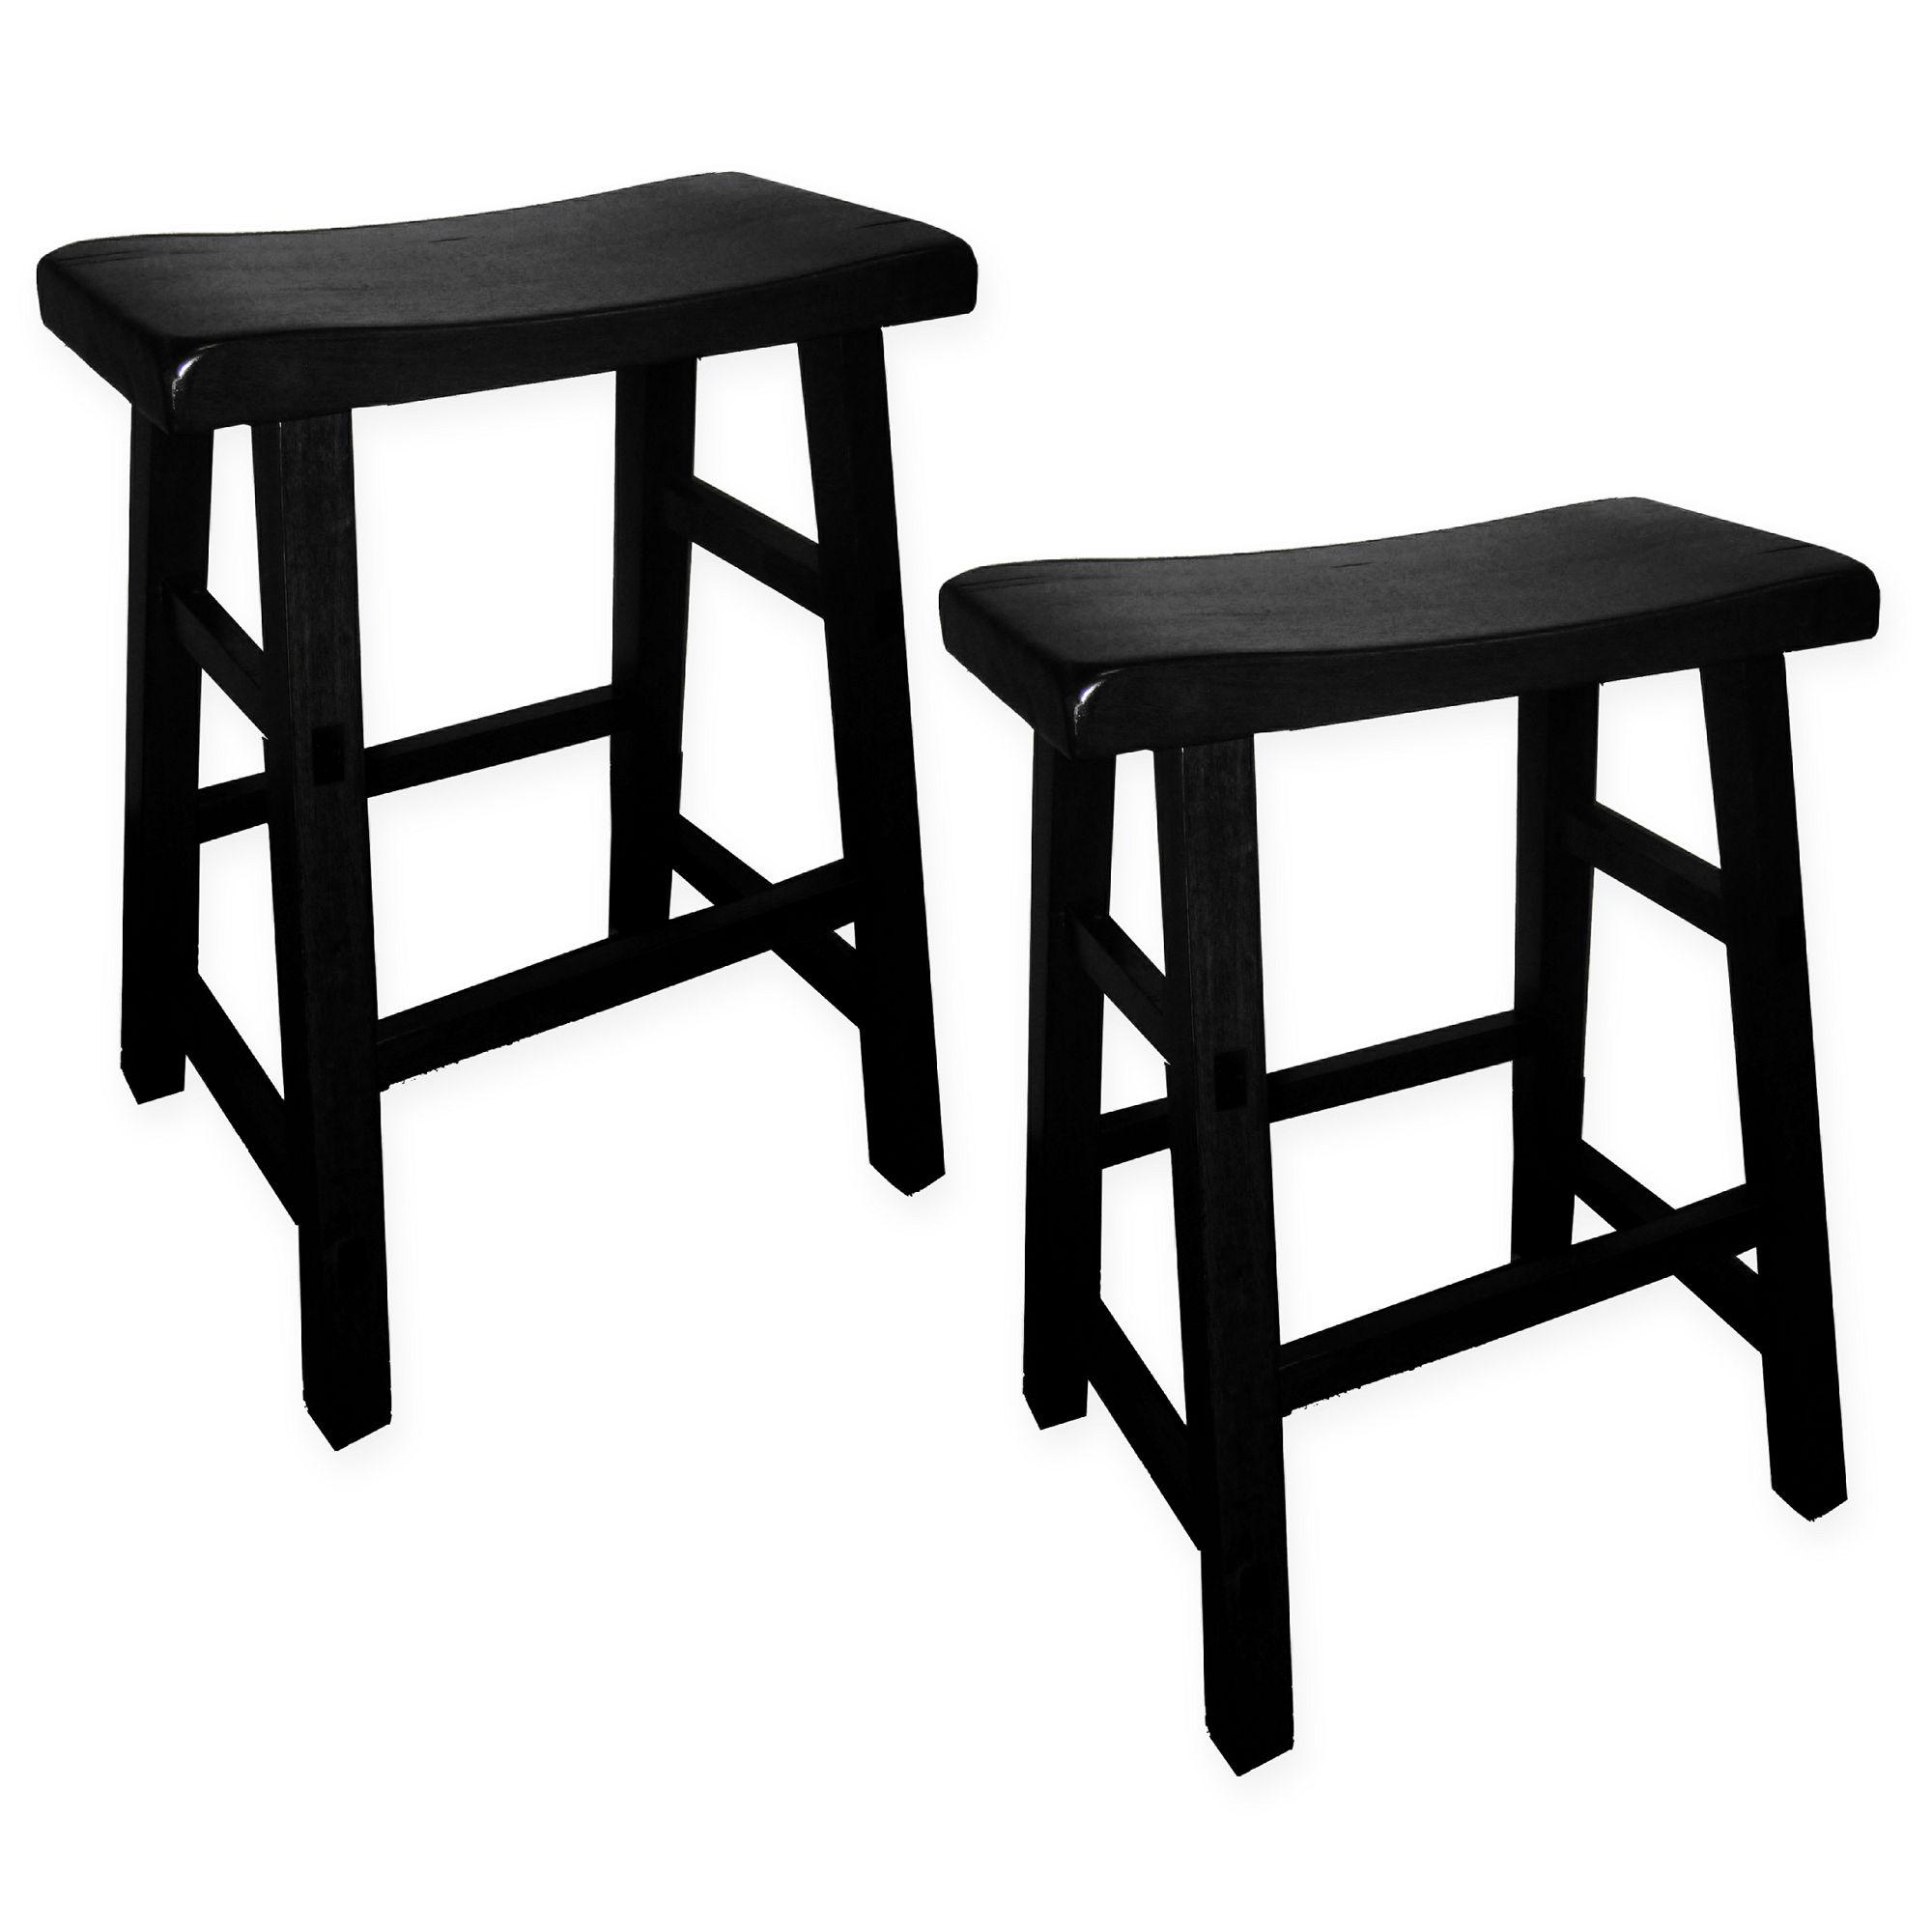 of 2 distressed saddle stools calvin set of 2 distressed saddle stools ...